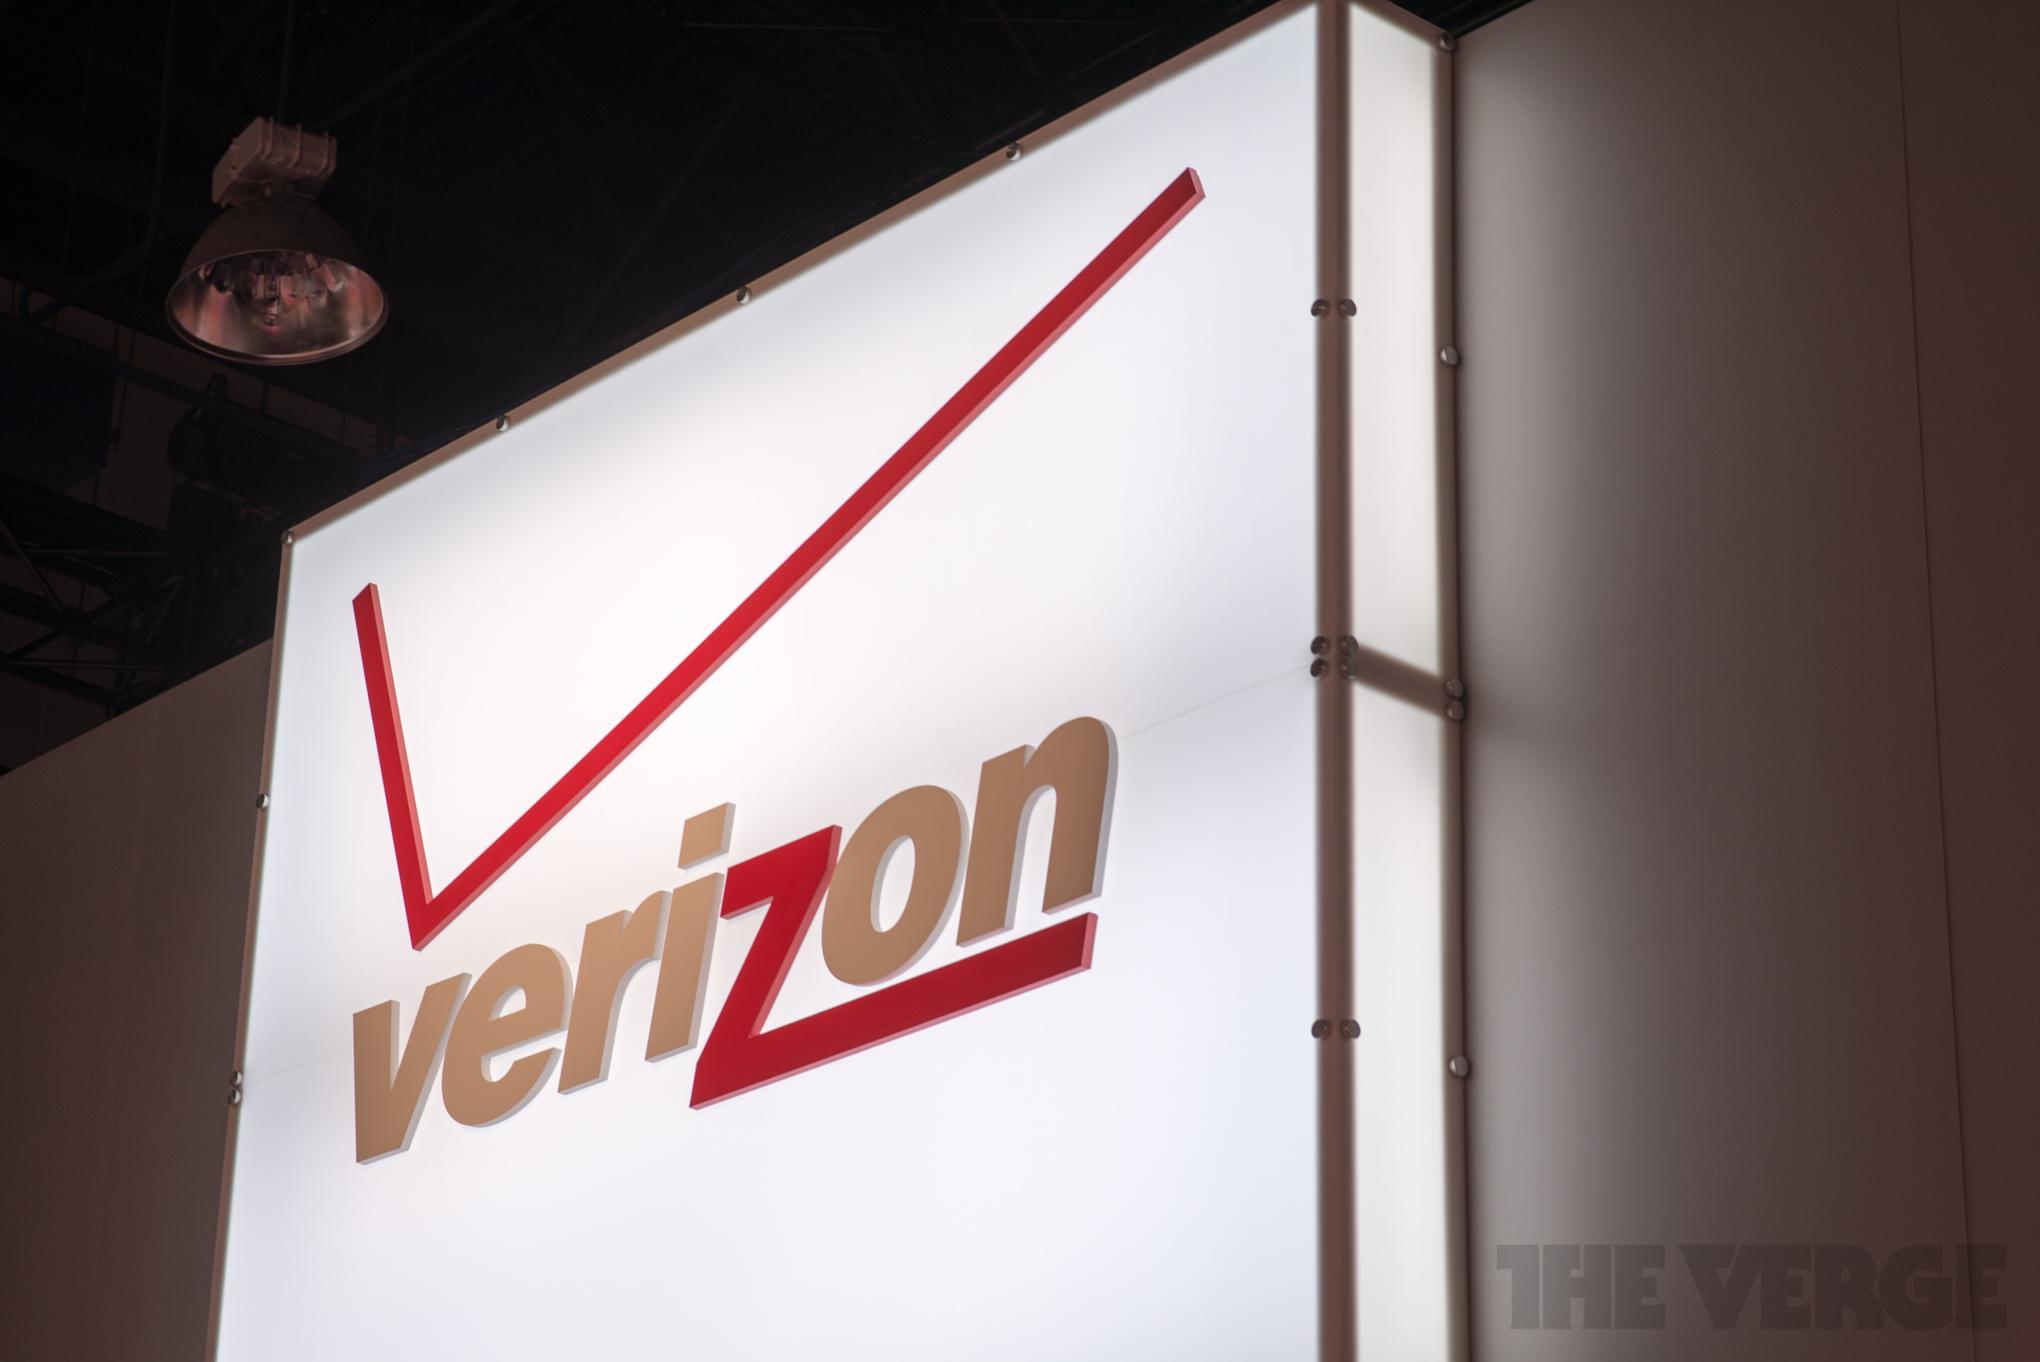 How do you get on Verizon's do not call list?